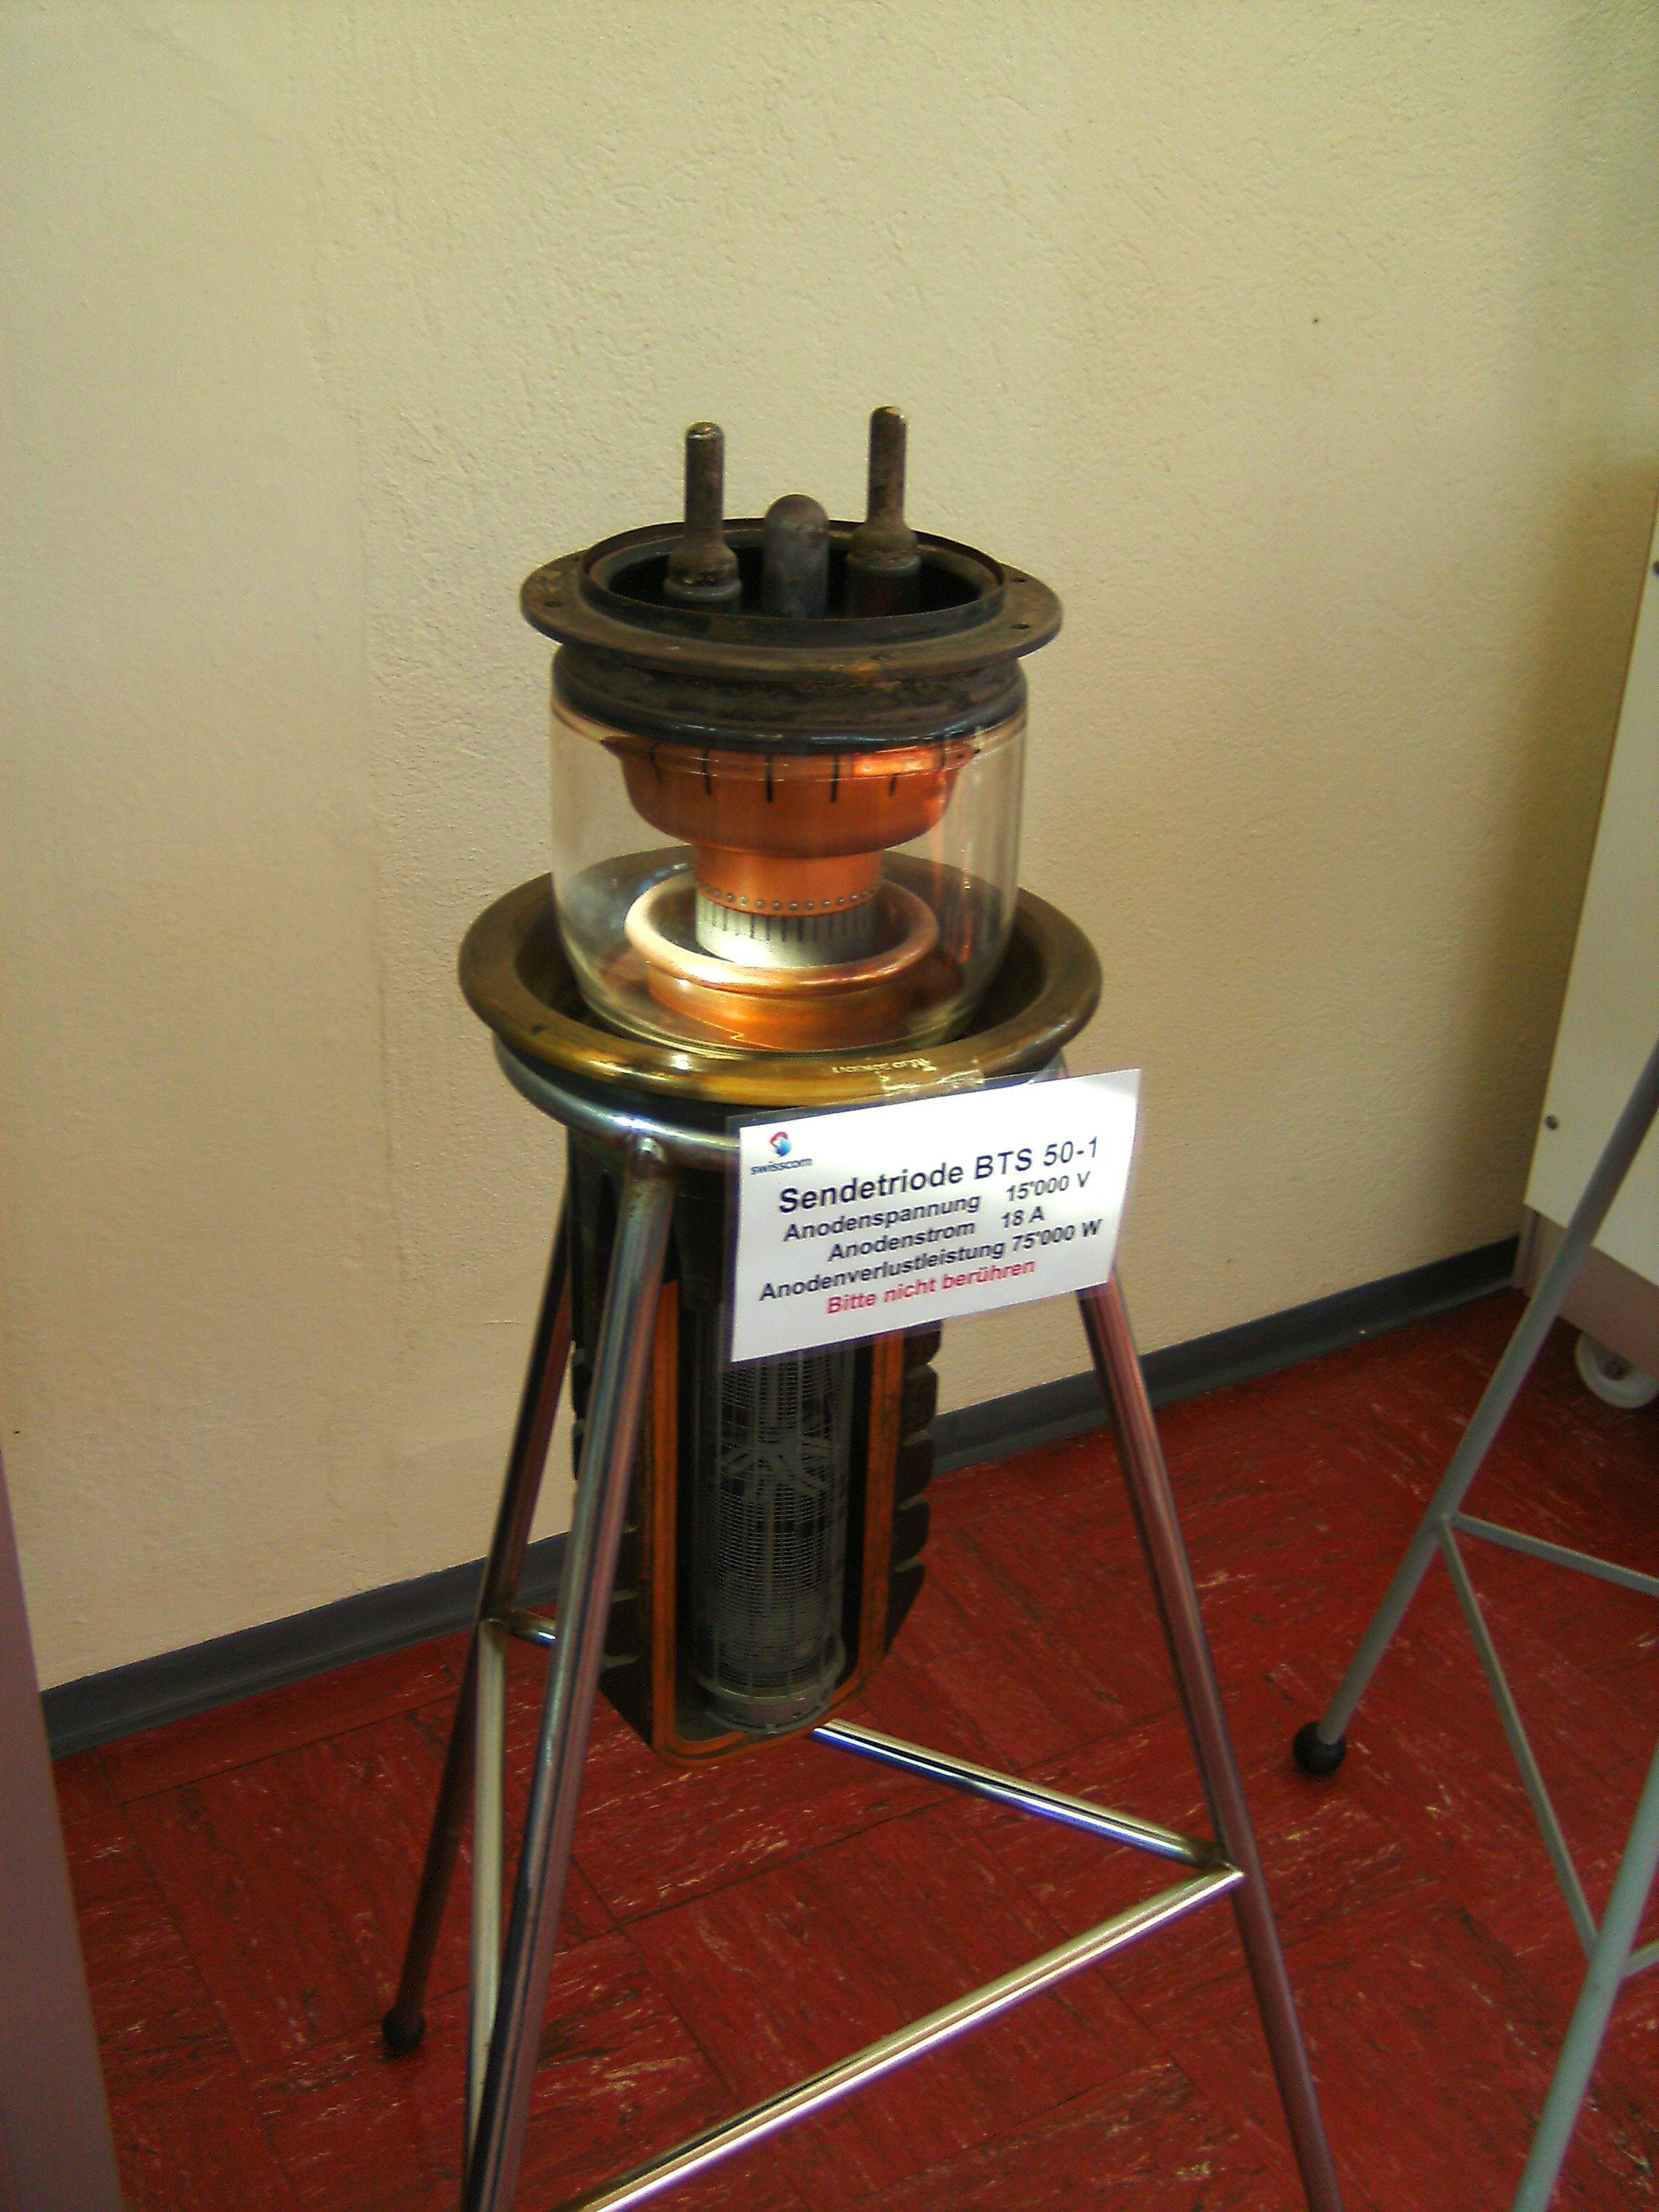 Electronics Irc Archive For 2016 07 29 2b1 Wiring Diagram Repair Manual